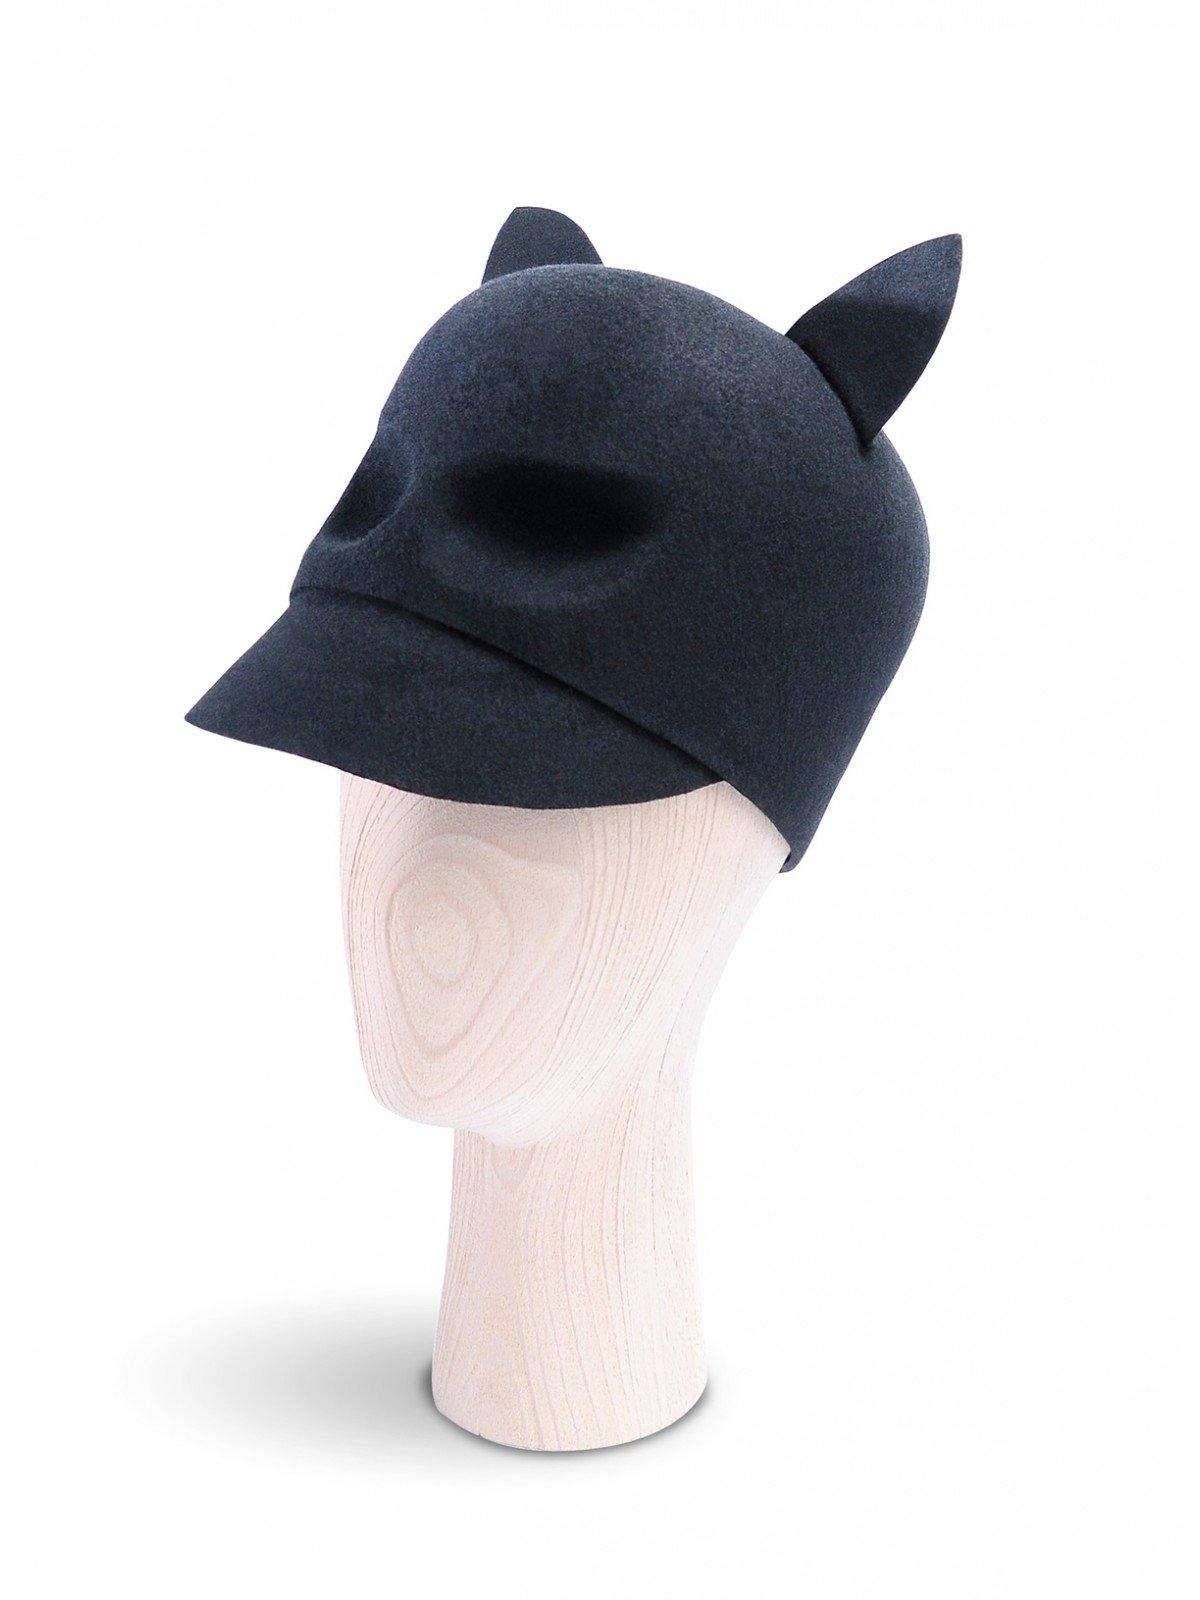 Catwoman Black Cap